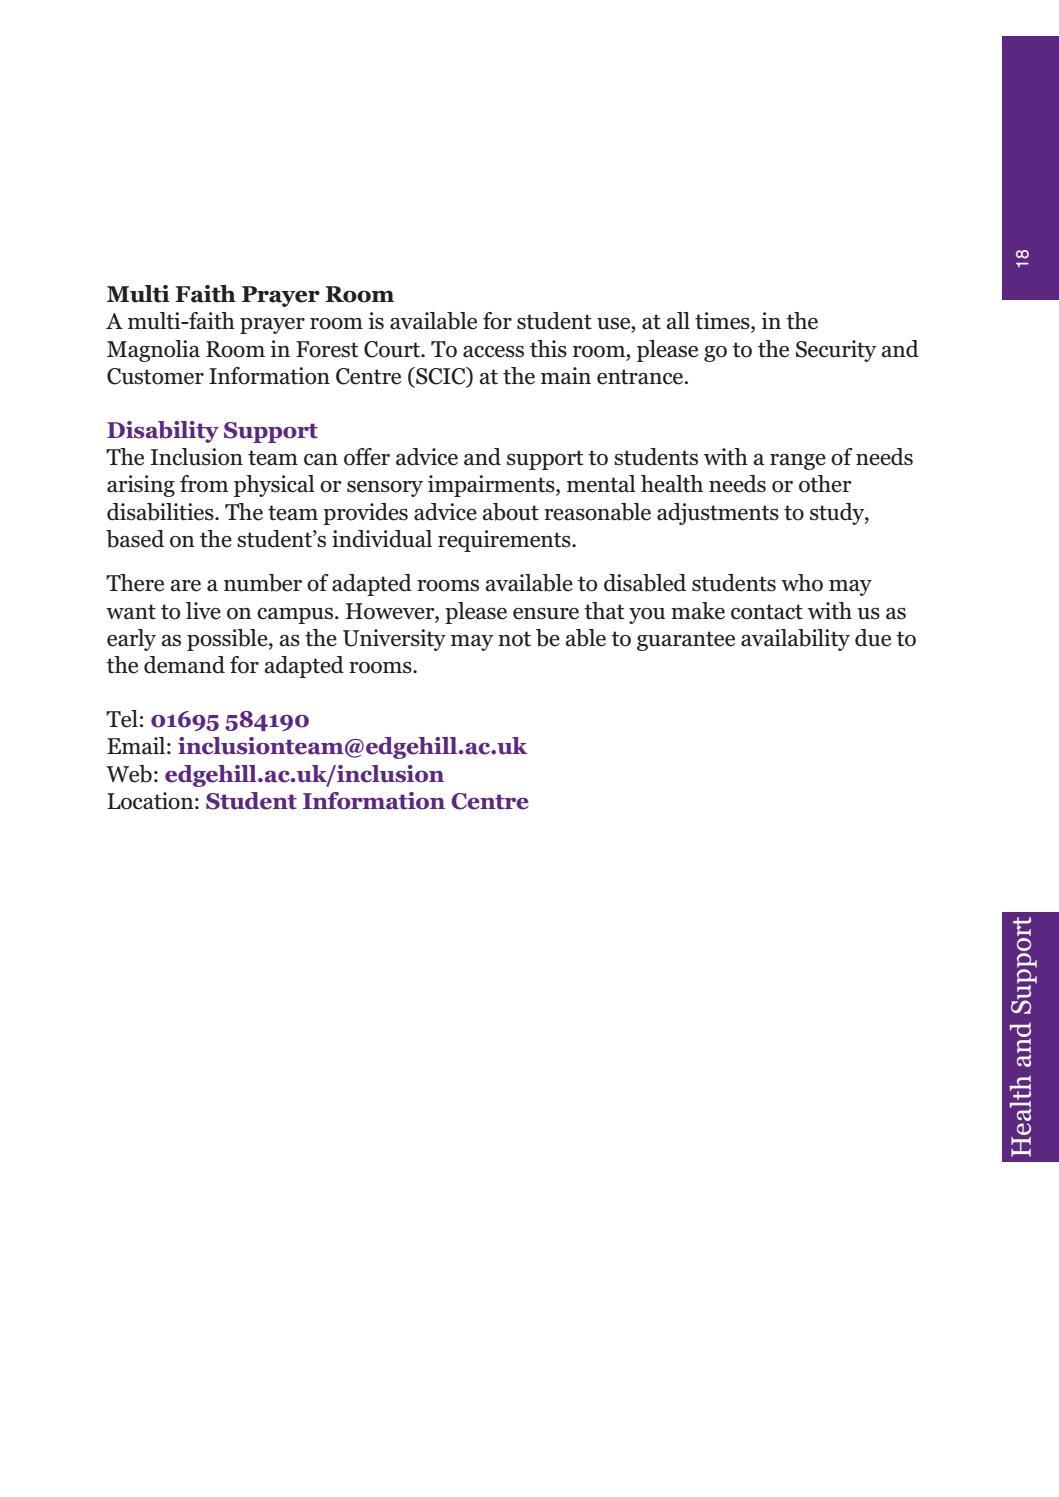 Halls Handbook 2017/18 by Edge Hill University - issuu